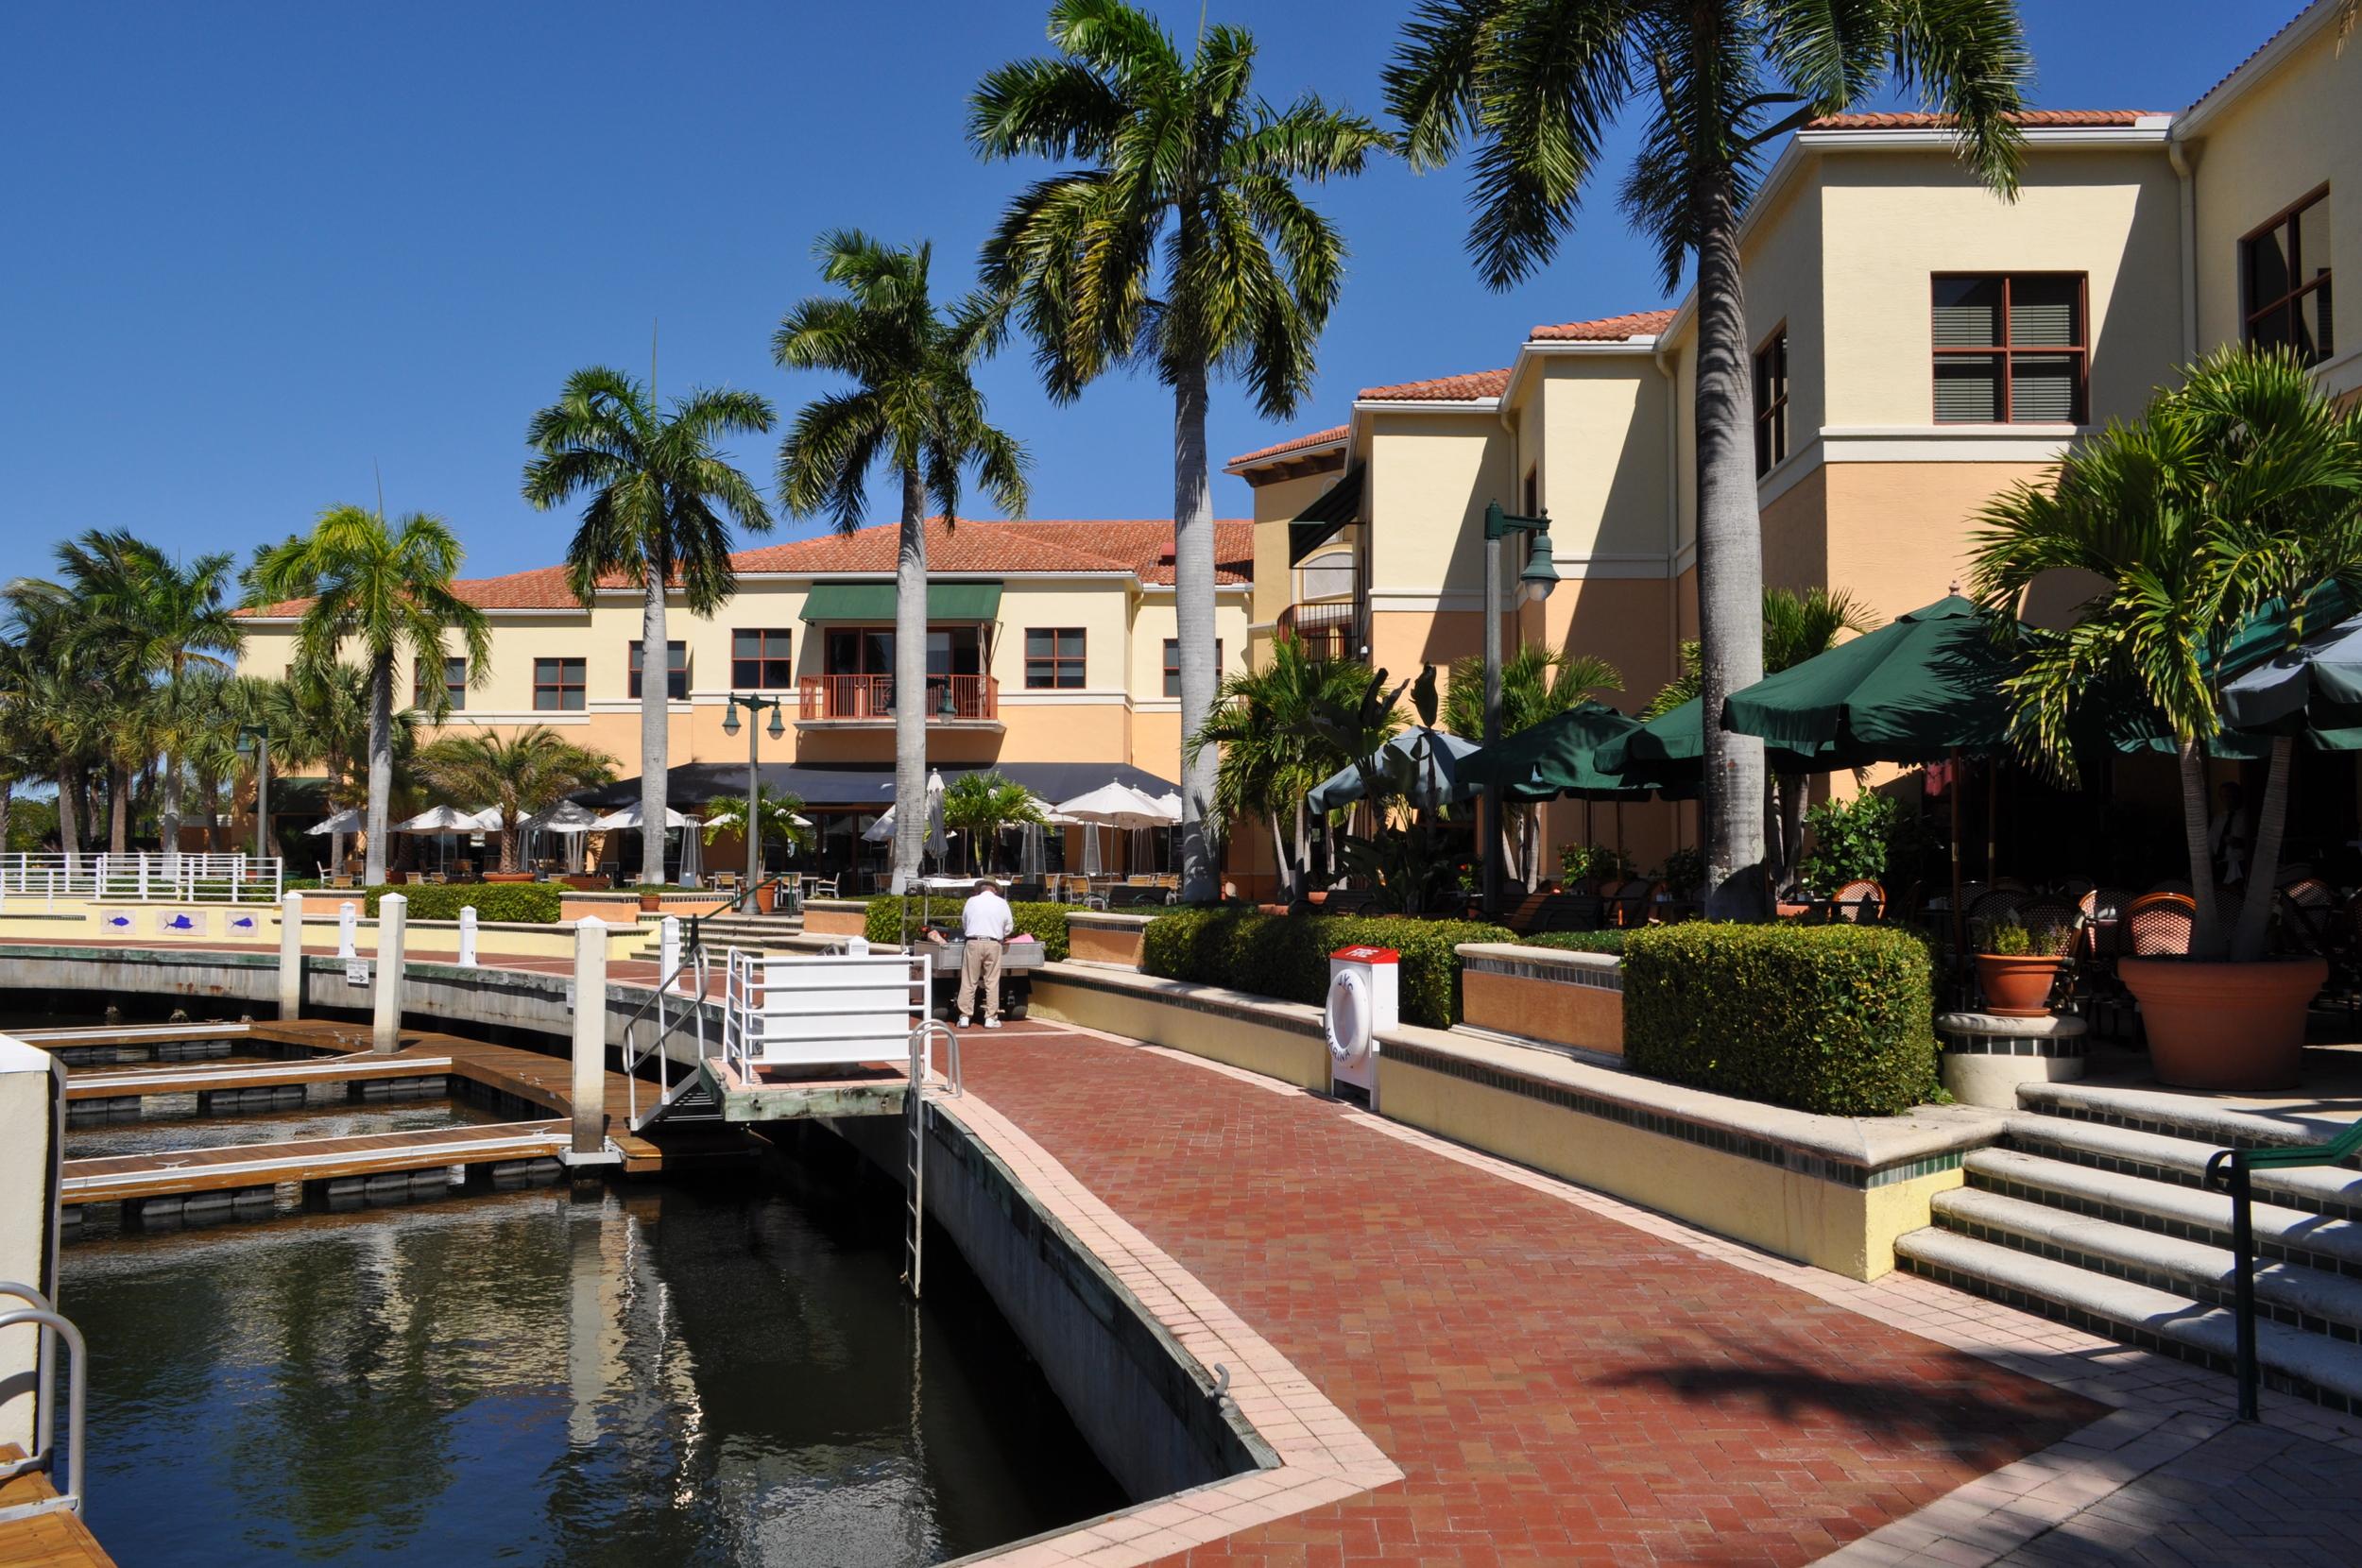 Jupiter Yacht Club Florida Riverwalk Restaurant Outdoor Seating.JPG